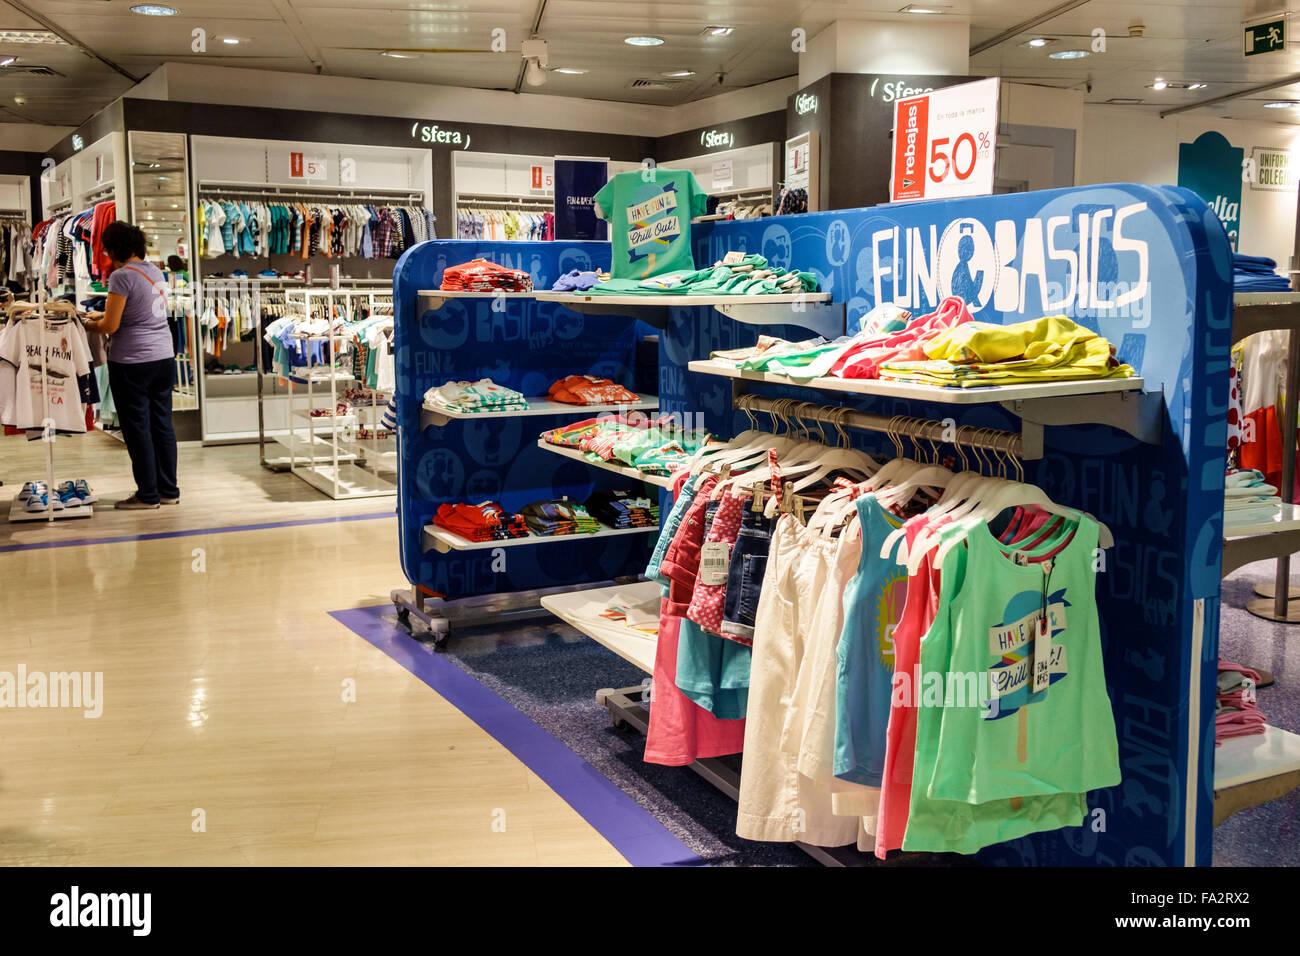 Spain Europe Spanish Hispanic Madrid Moncloa-Aravaca Calle de la Princesa El Corte Ingles department store shopping Stock Photo